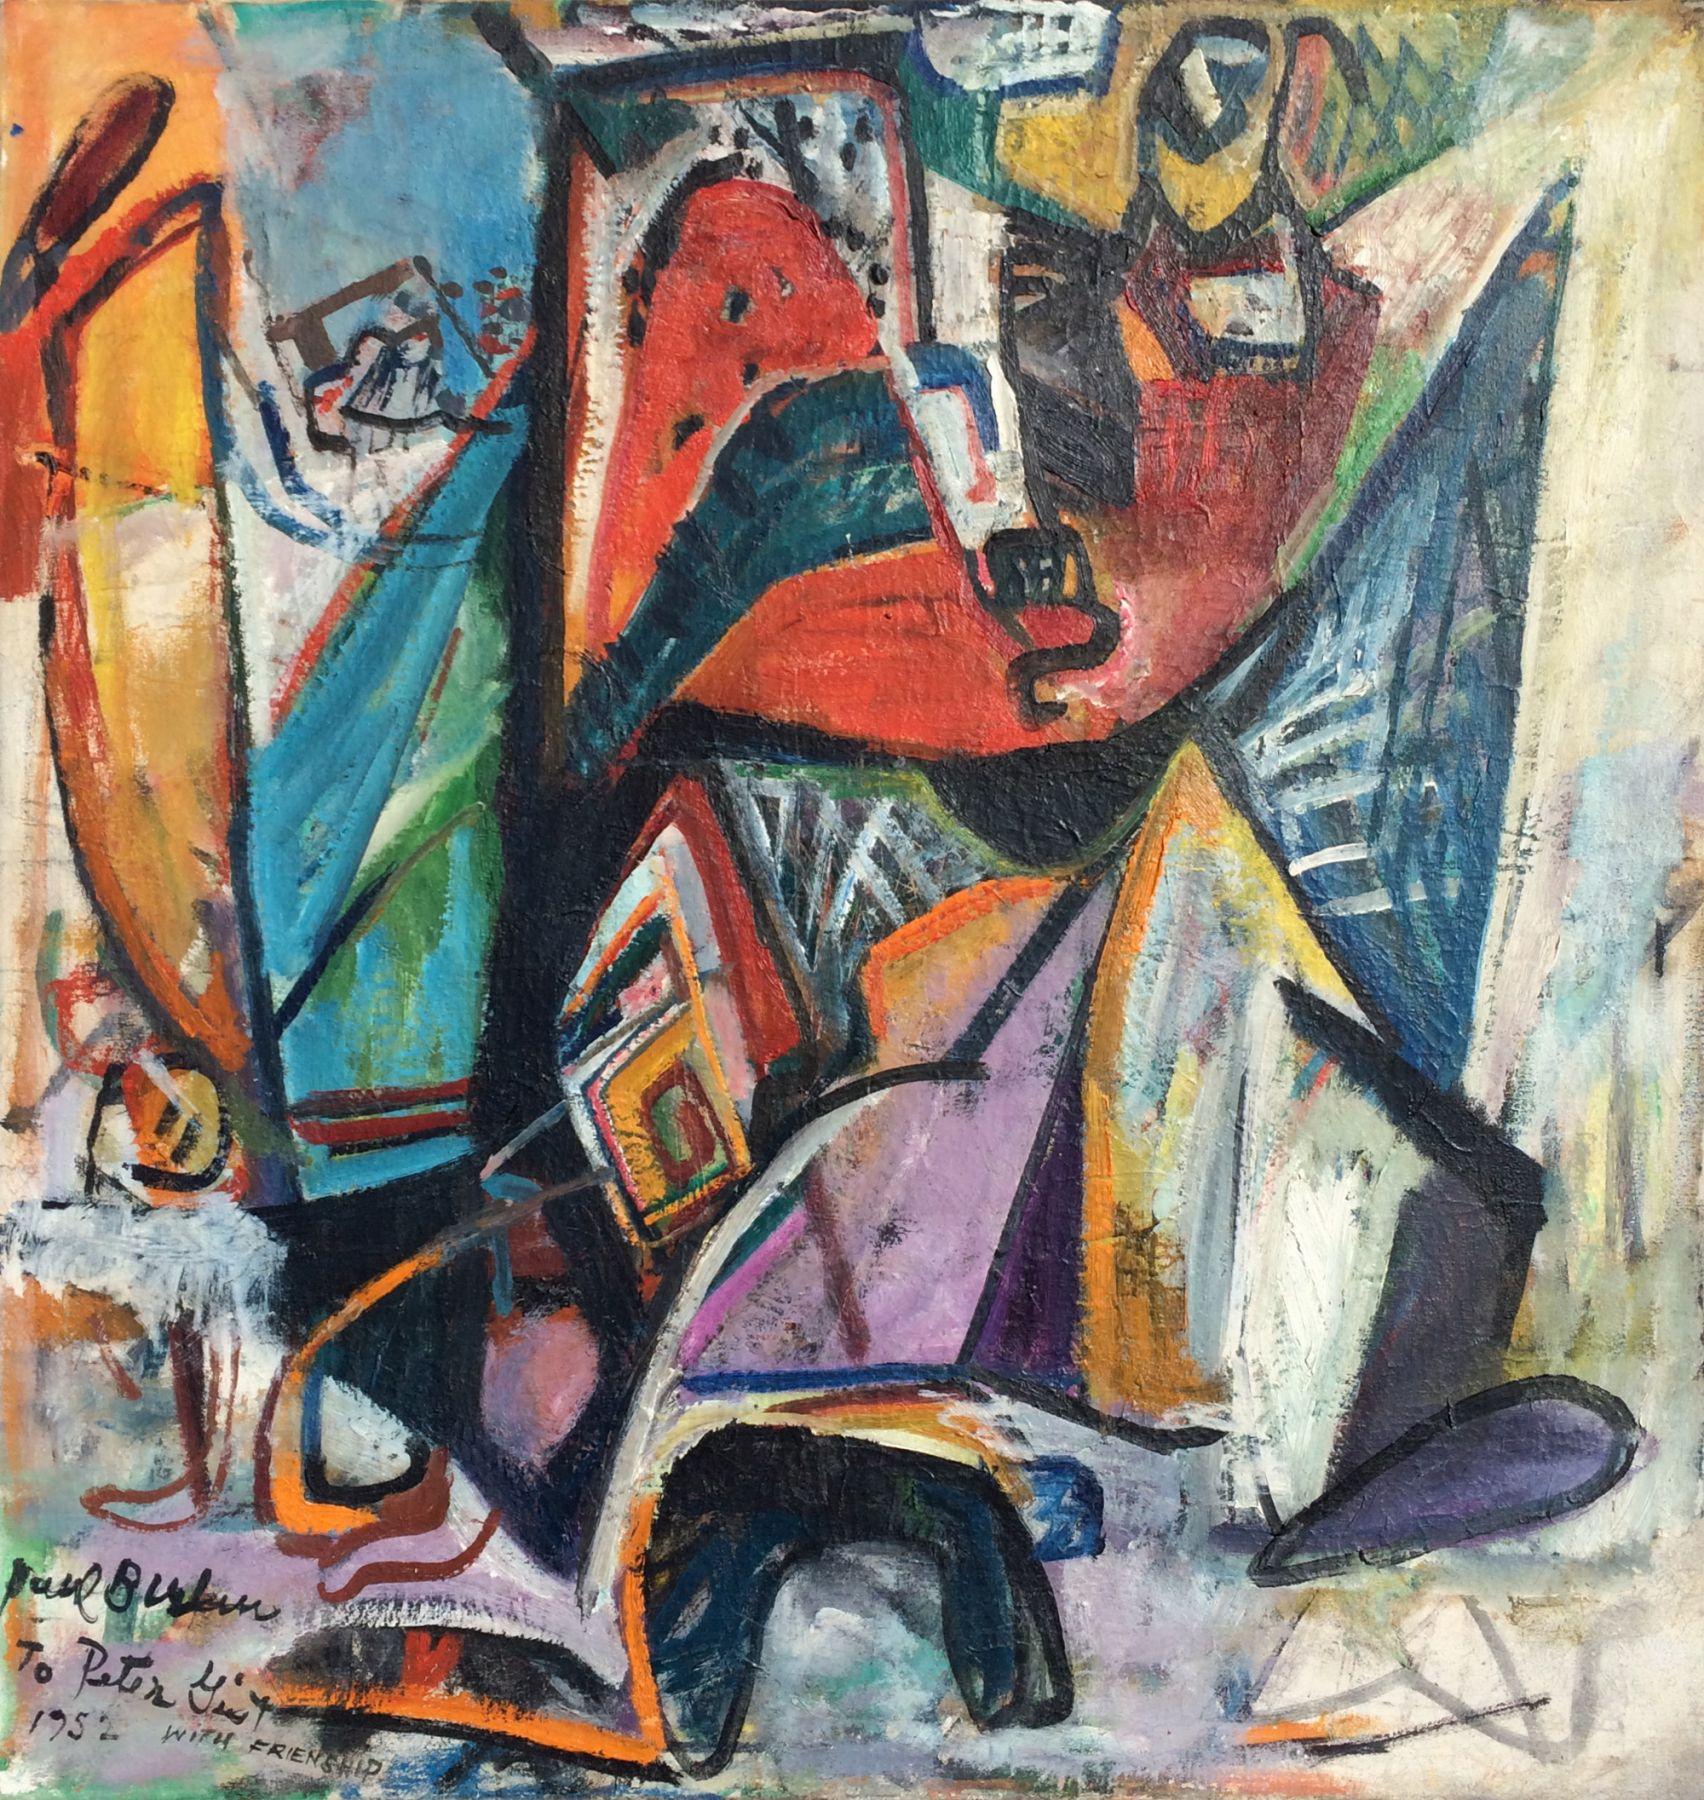 Paul Burlin, Composition